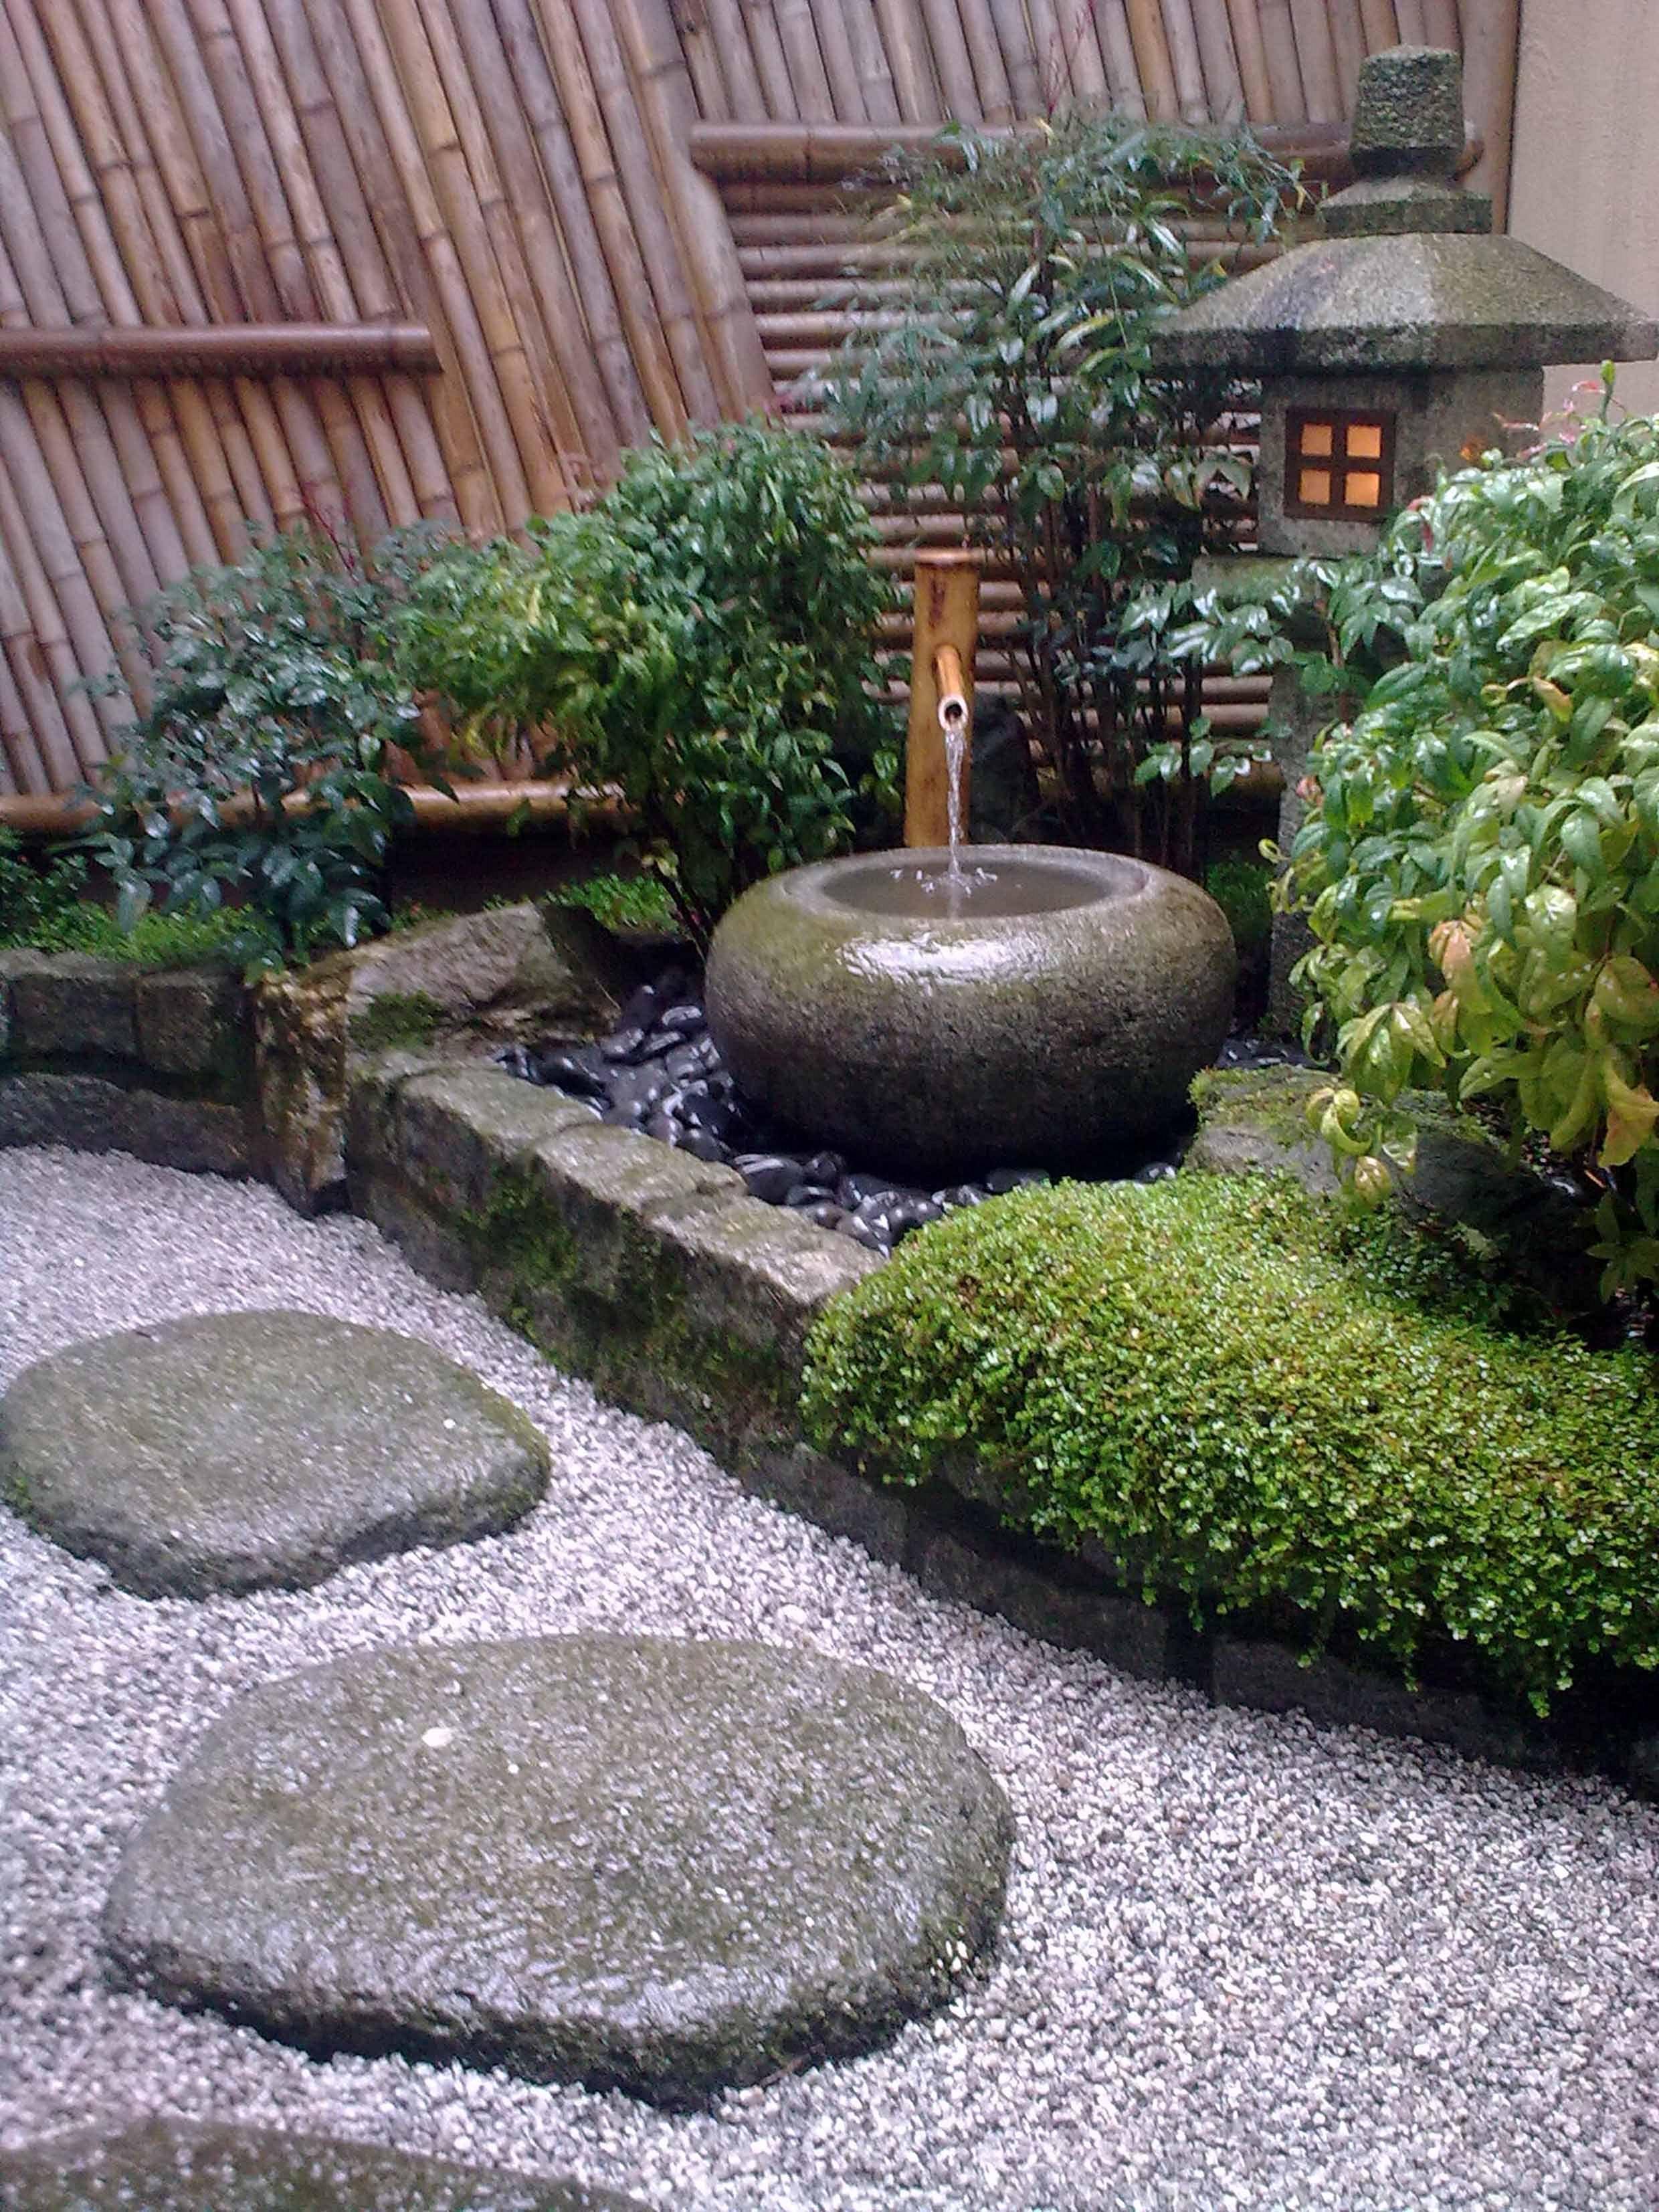 Top 10 Beautiful Zen Garden Ideas For Backyard | Landscaping ...